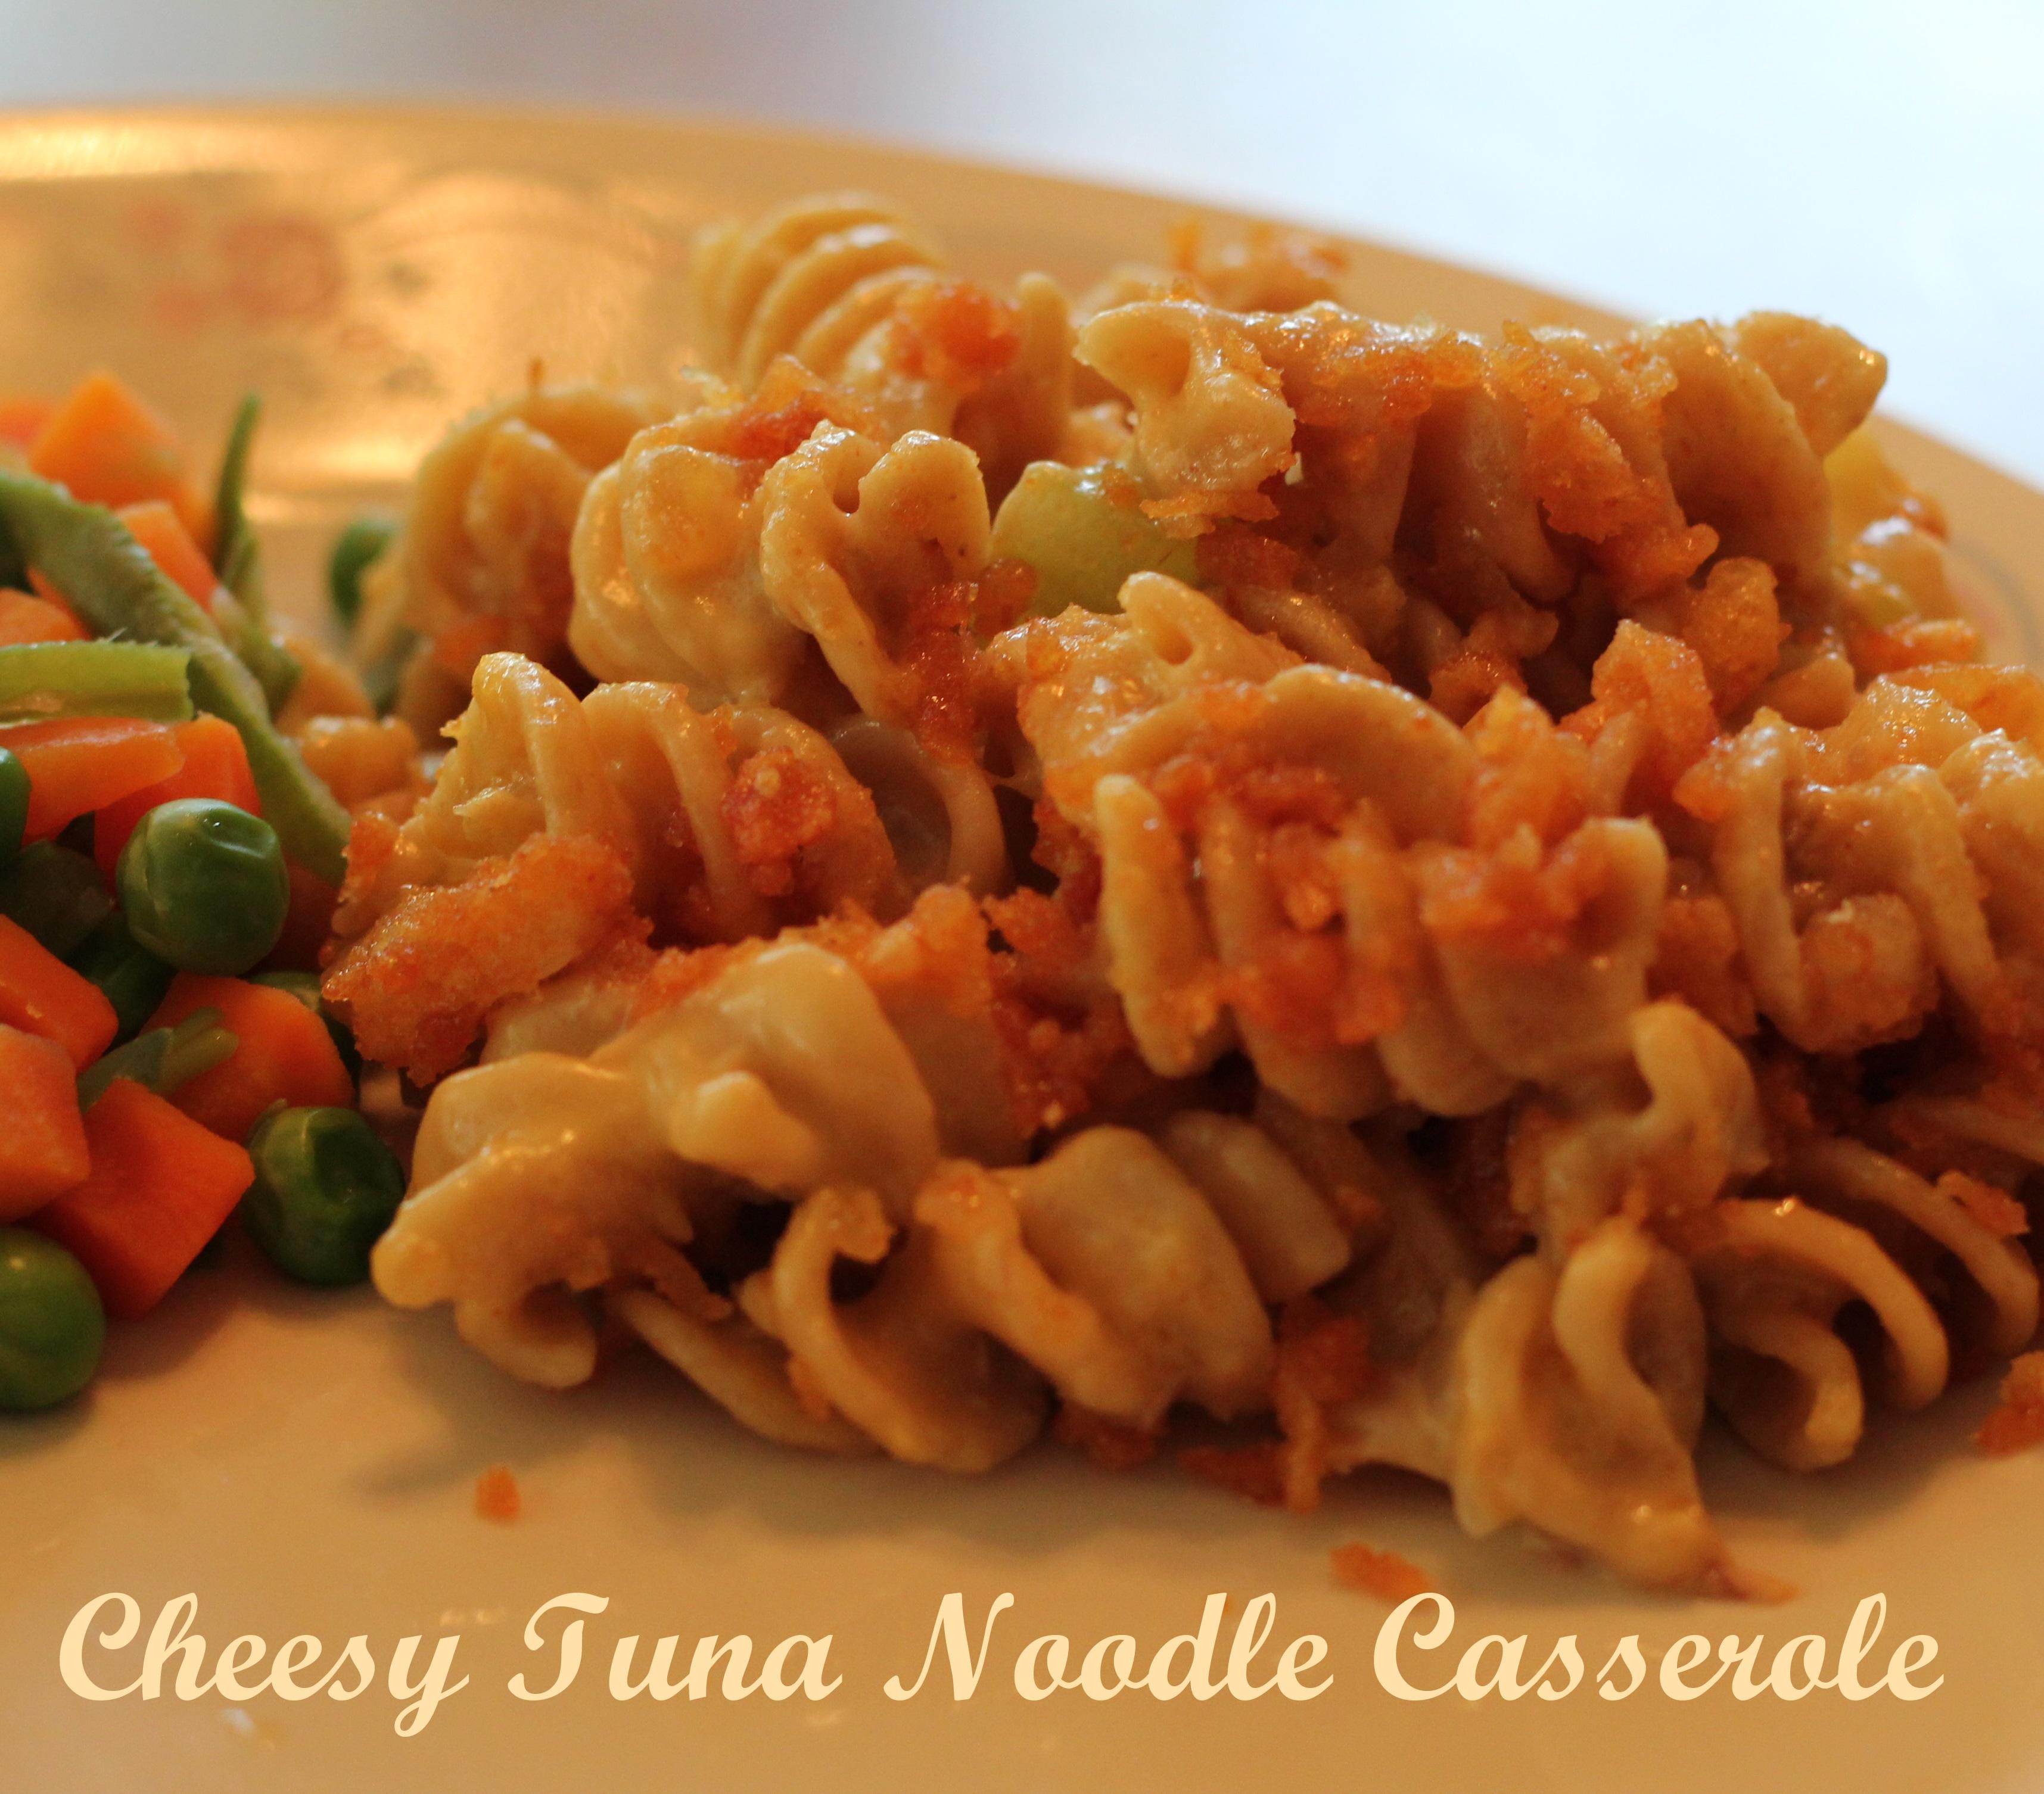 Easy Cheesy Tuna Noodle Casserole! (Pinterest) » LatterDay Mommy